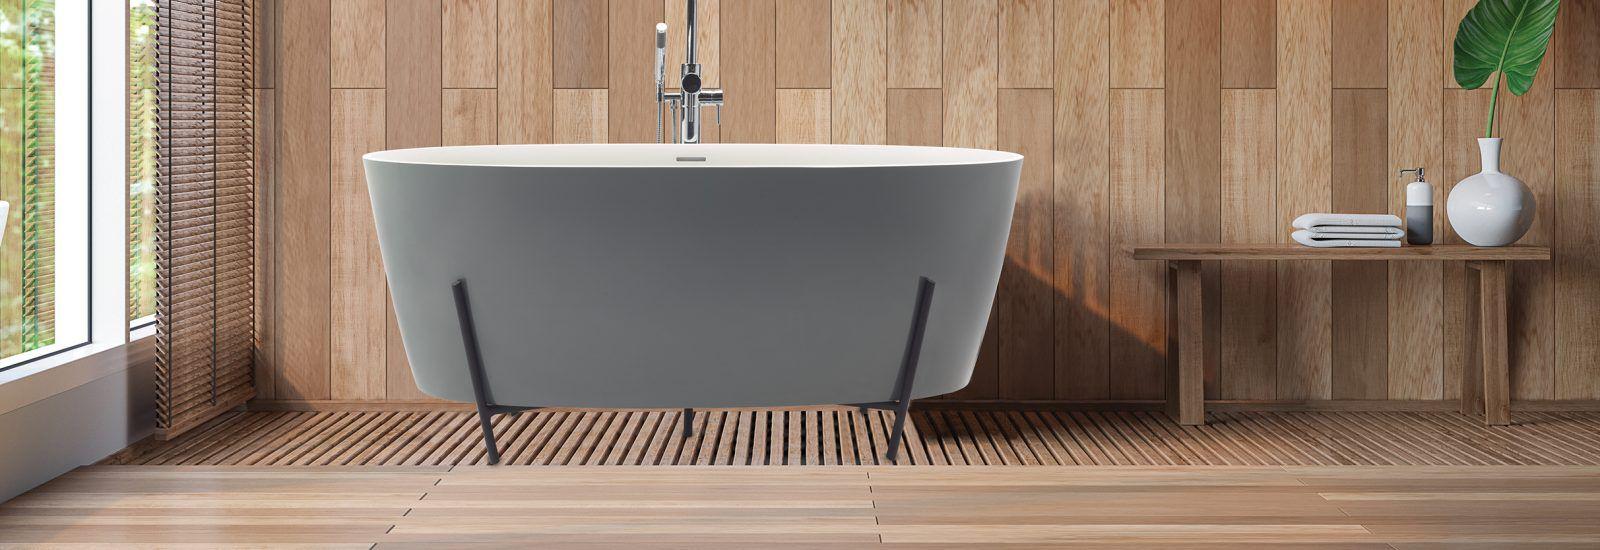 RM Living Contemporary Interior Design Cincinnati Modern Bathroom By MTI MTI7